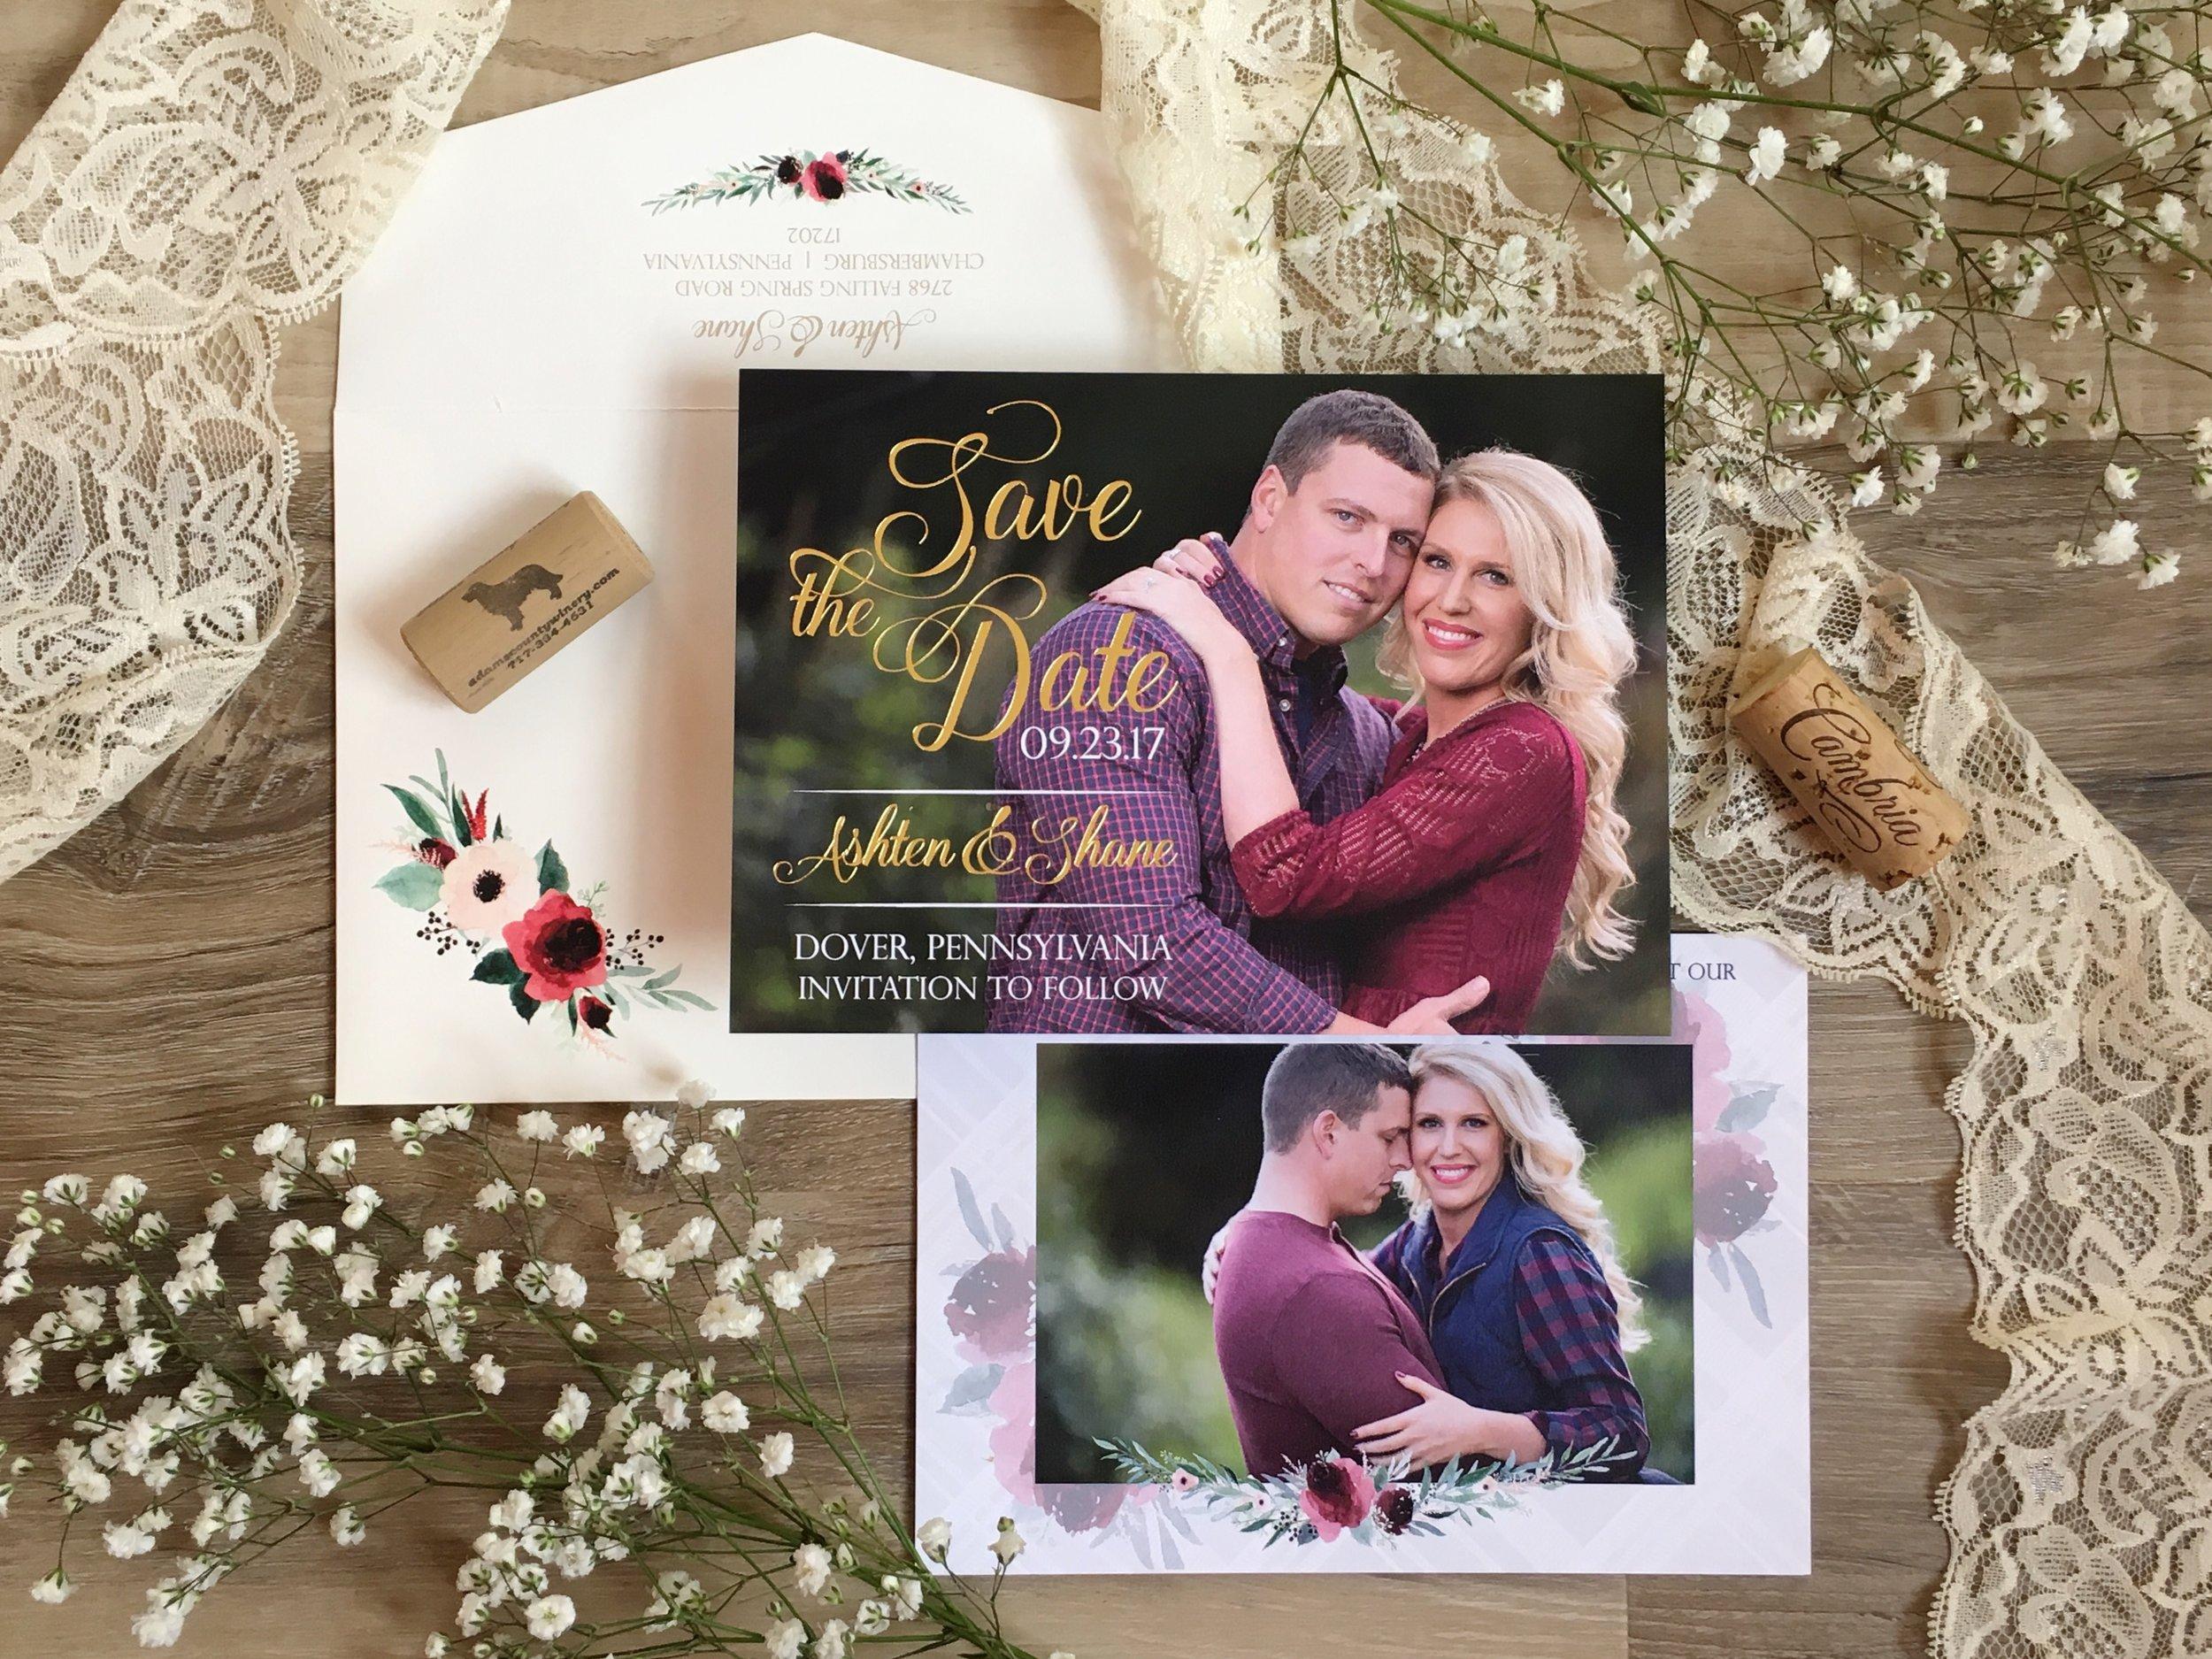 Central PA, York PA, JesSmith Designs, custom, wedding, invitations, bridal, announcements, save the date-02-02 20.25.26.jpg